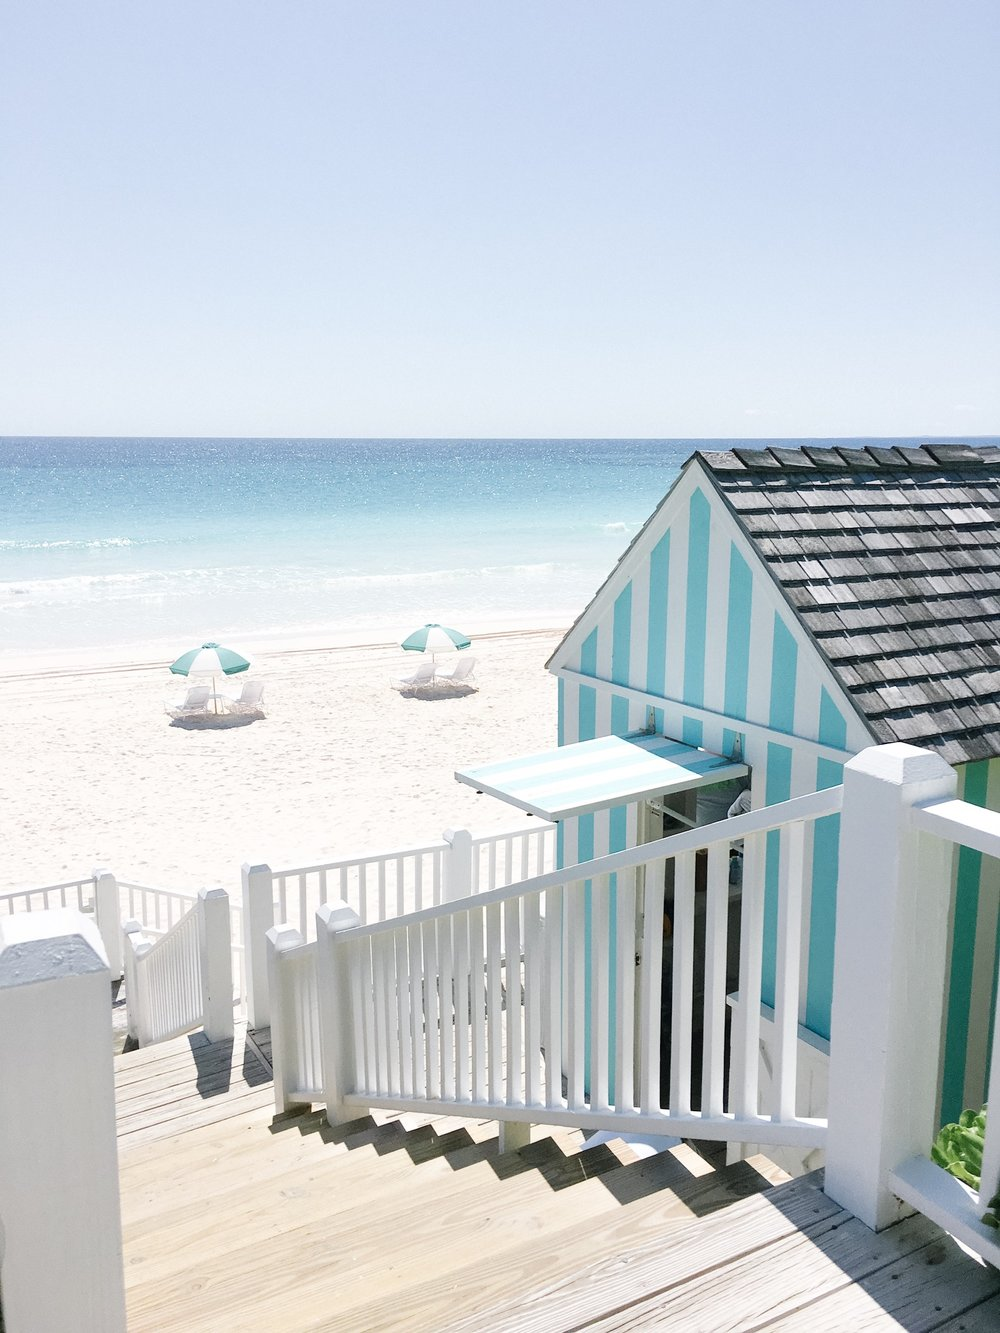 bahamas travel guide.jpg